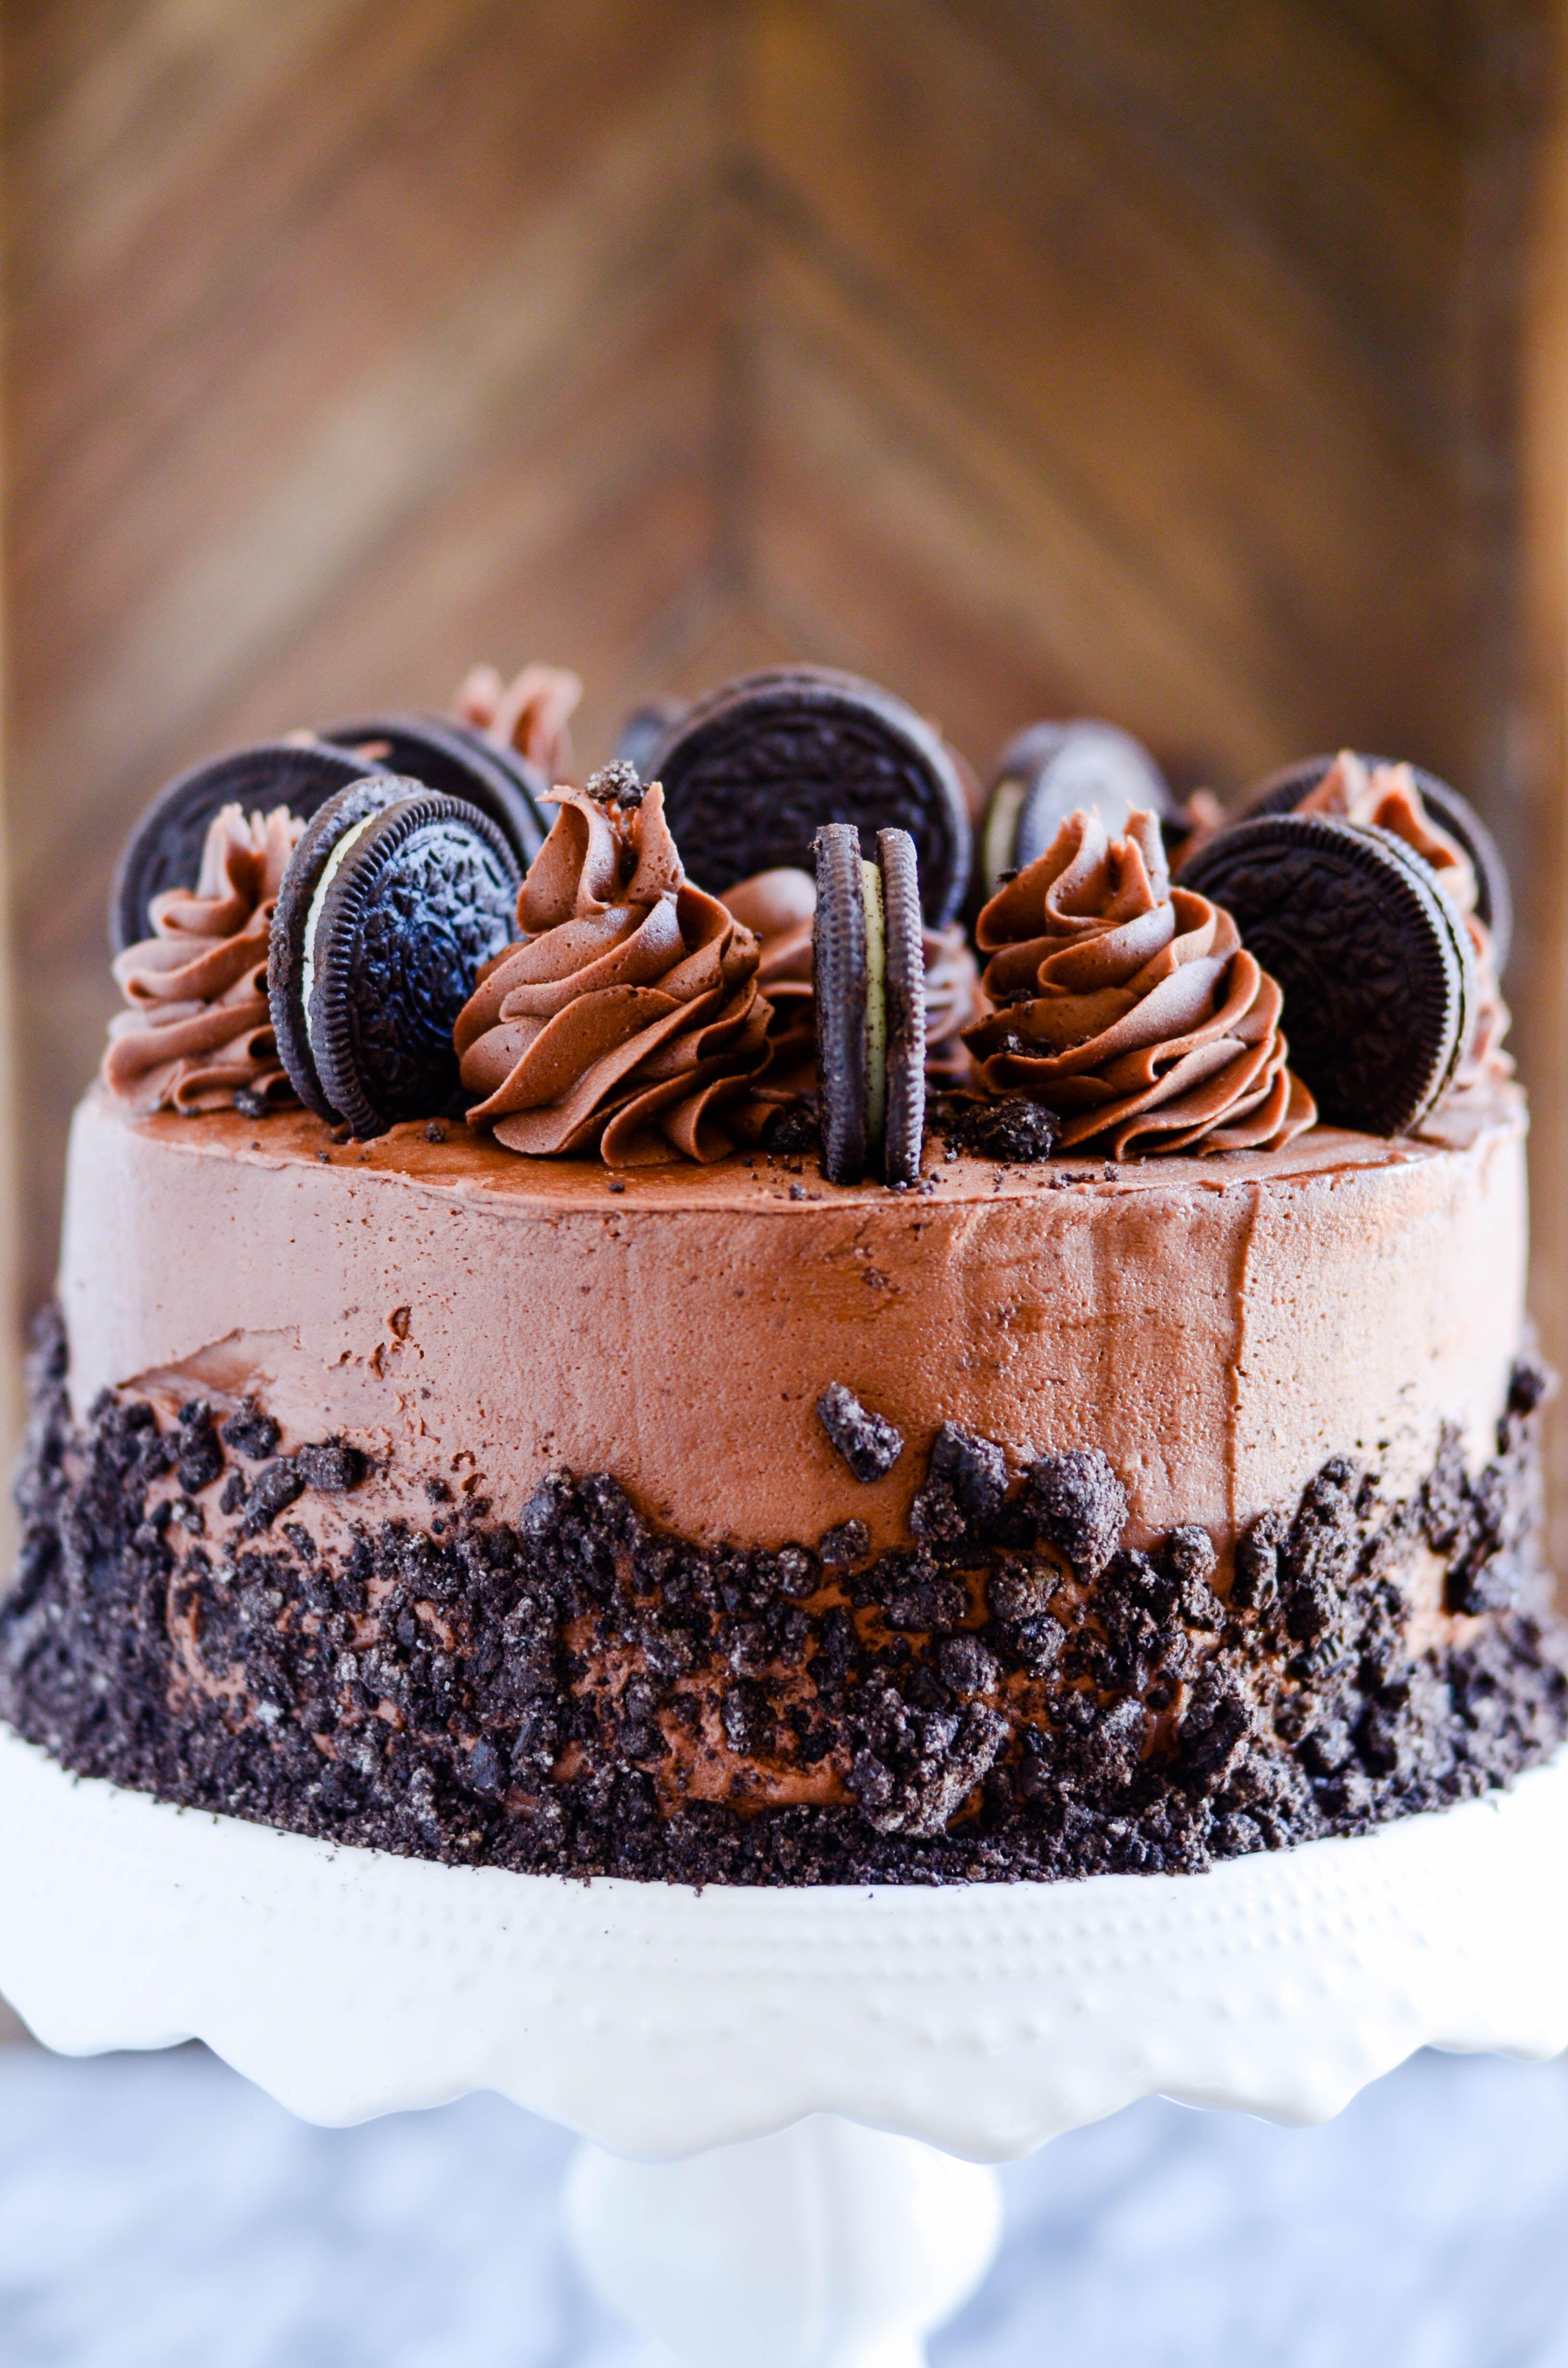 Terrific Cookies Cream Chocolate Layer Cake Recipe Chocolate Oreo Funny Birthday Cards Online Overcheapnameinfo